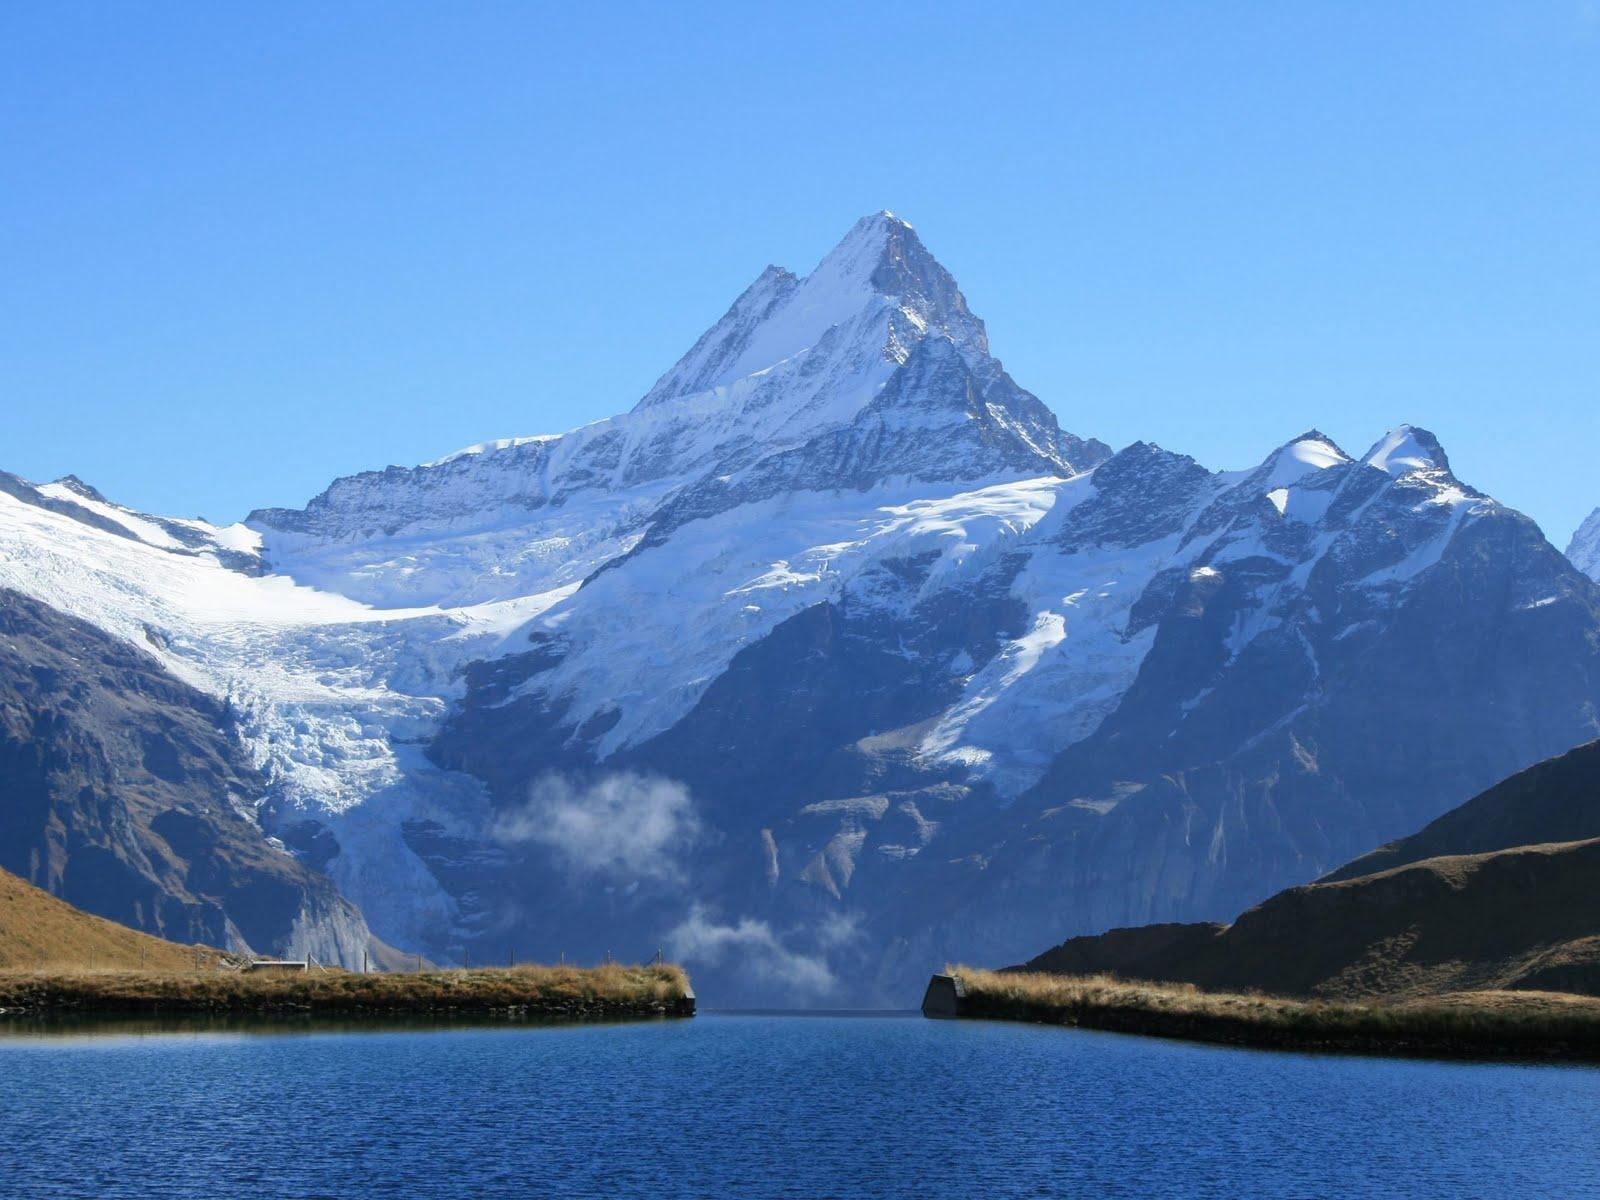 lake and mountain 1920x1440 Free hd 3d wallpaper downloads